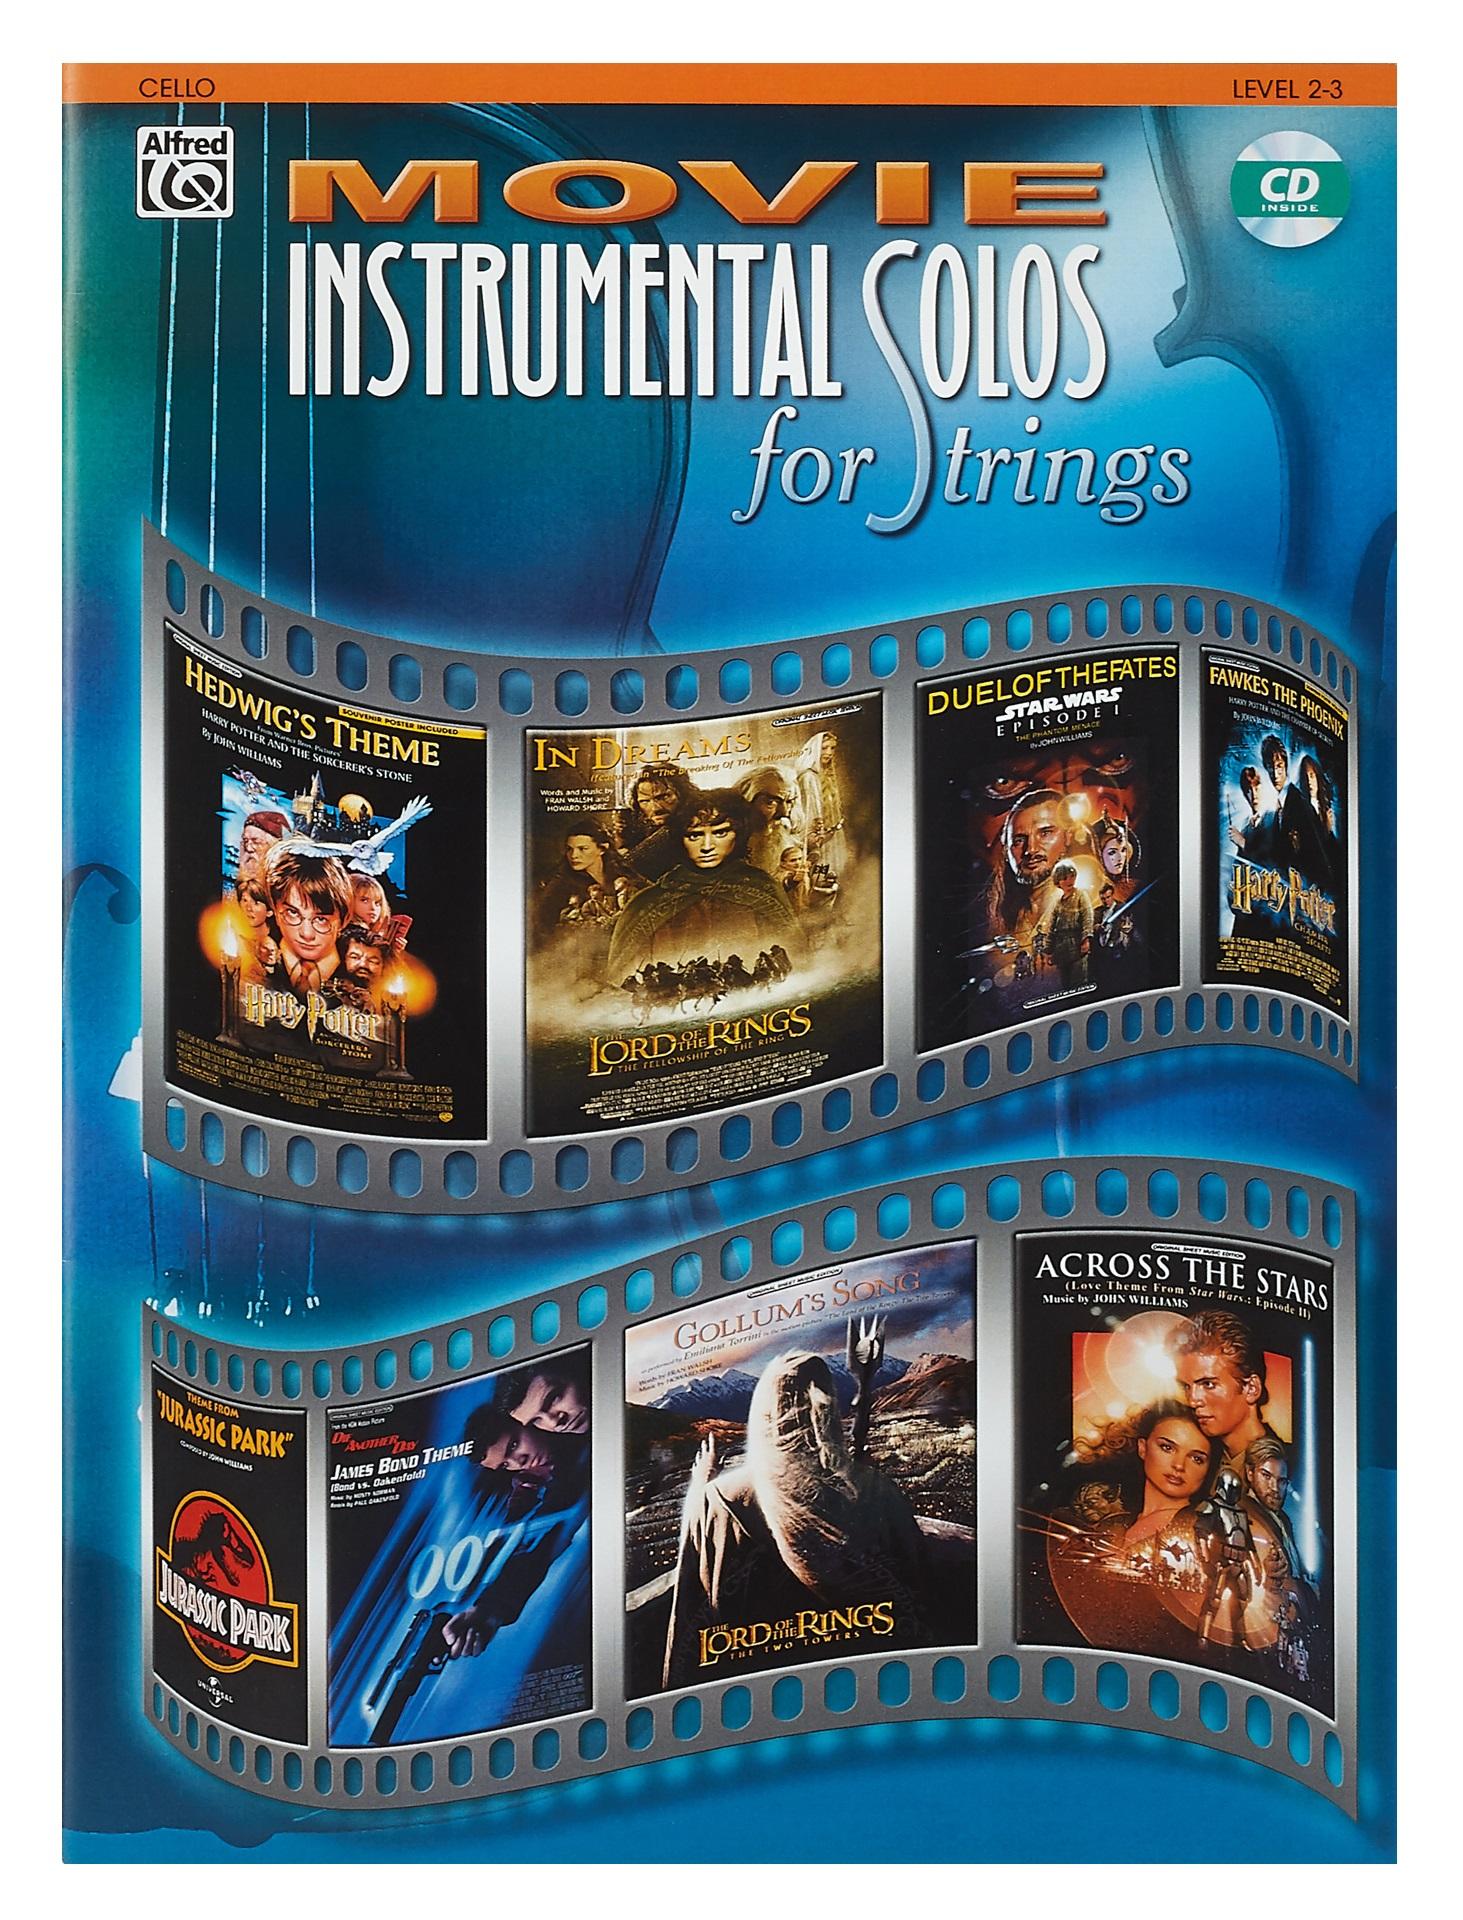 MS Movie Instrumental Solos, Cello Level 2-3 Book/CD